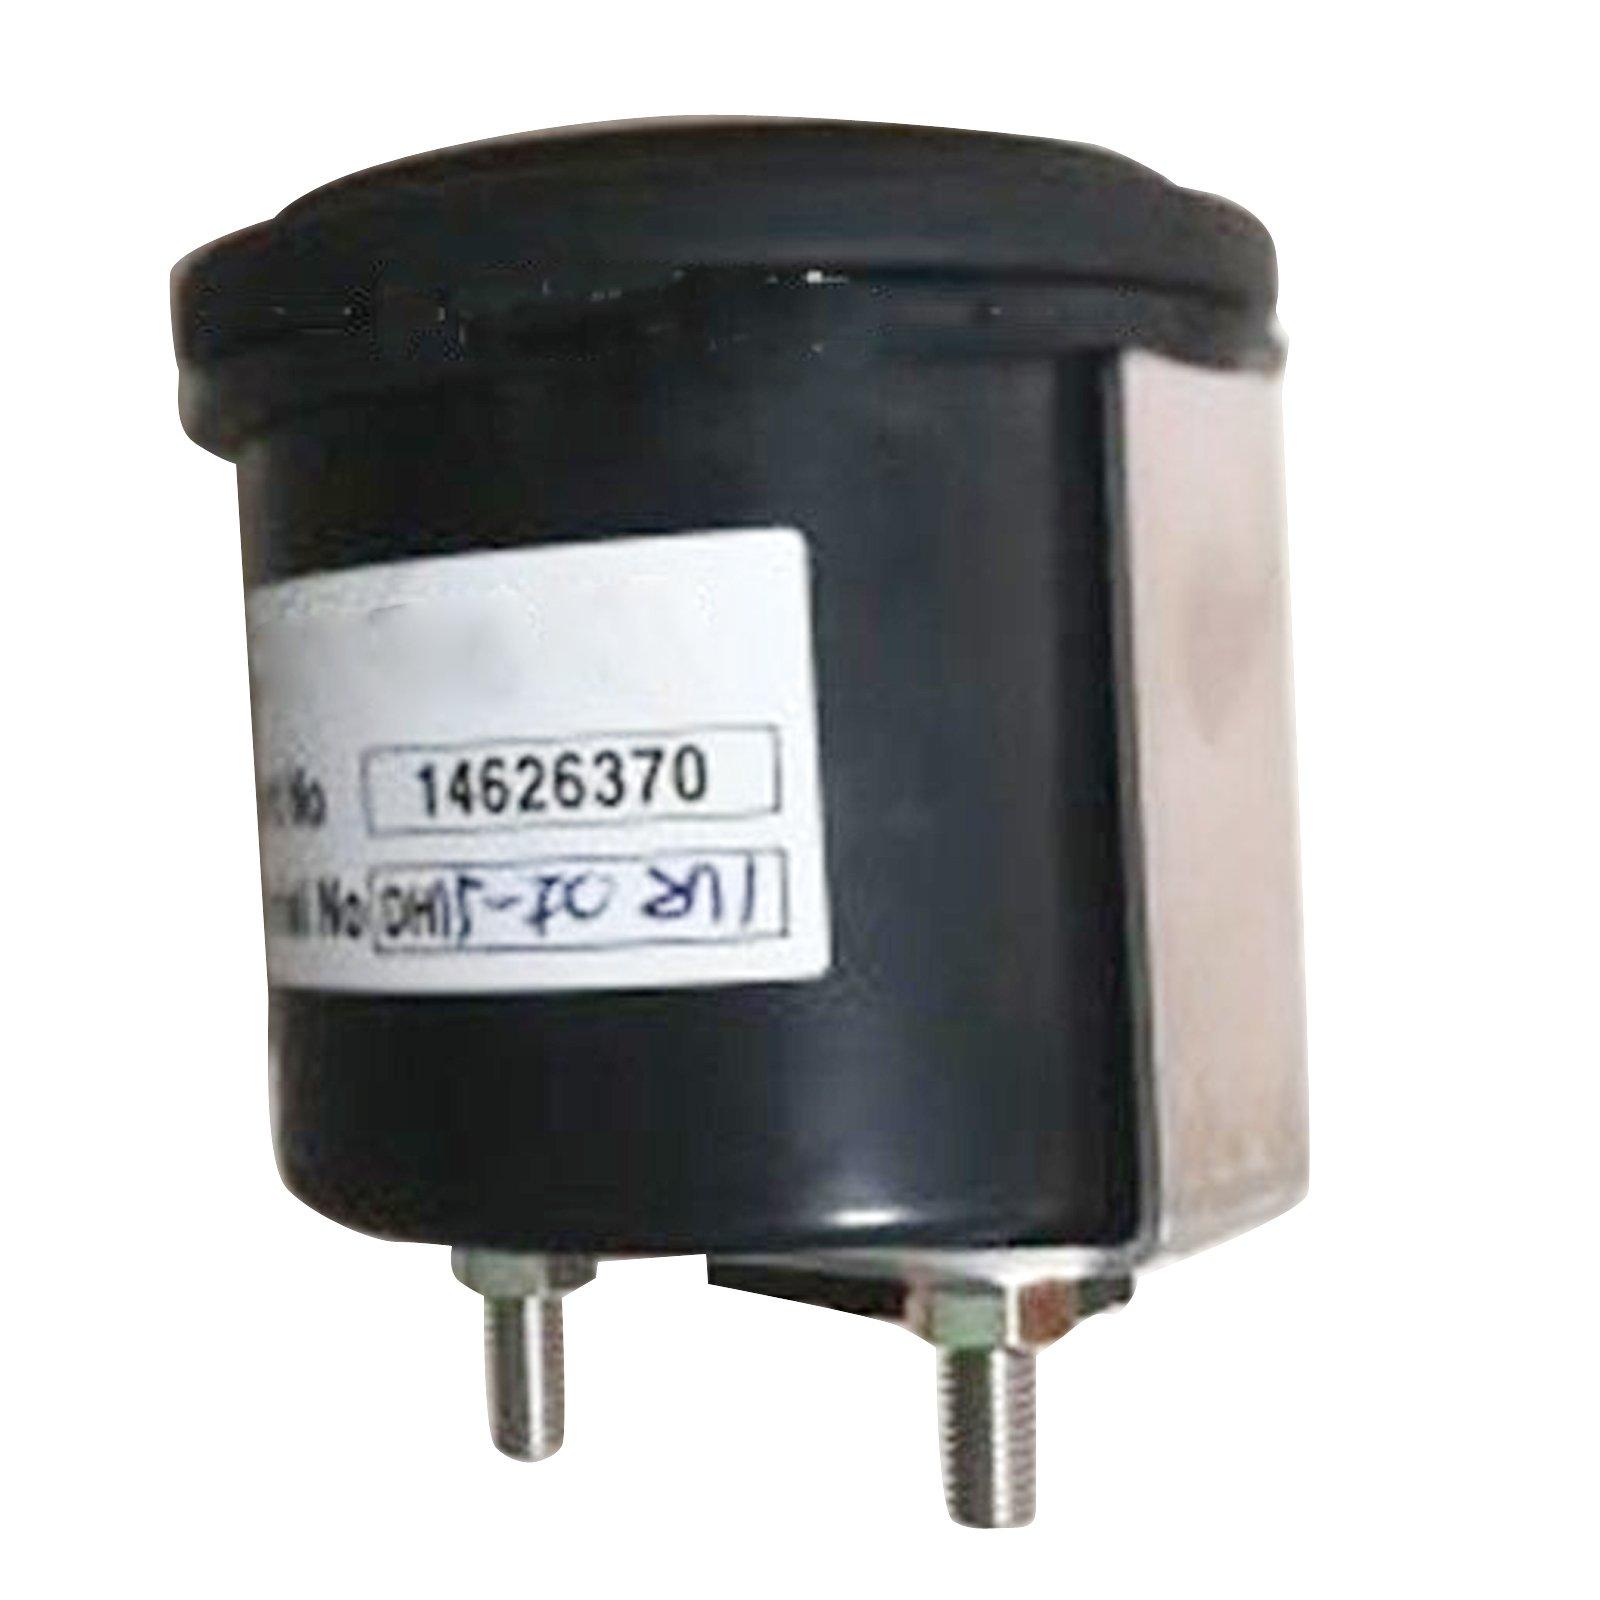 SINOCMP VOE 14626370 VOE14626370 Hour Timer Instrument Panel Hour Meter Gauges for Volvo EC210 EC210B EC240 B EC290 B EC360b EC460 BLC Excavator Parts, 3 Month Warranty